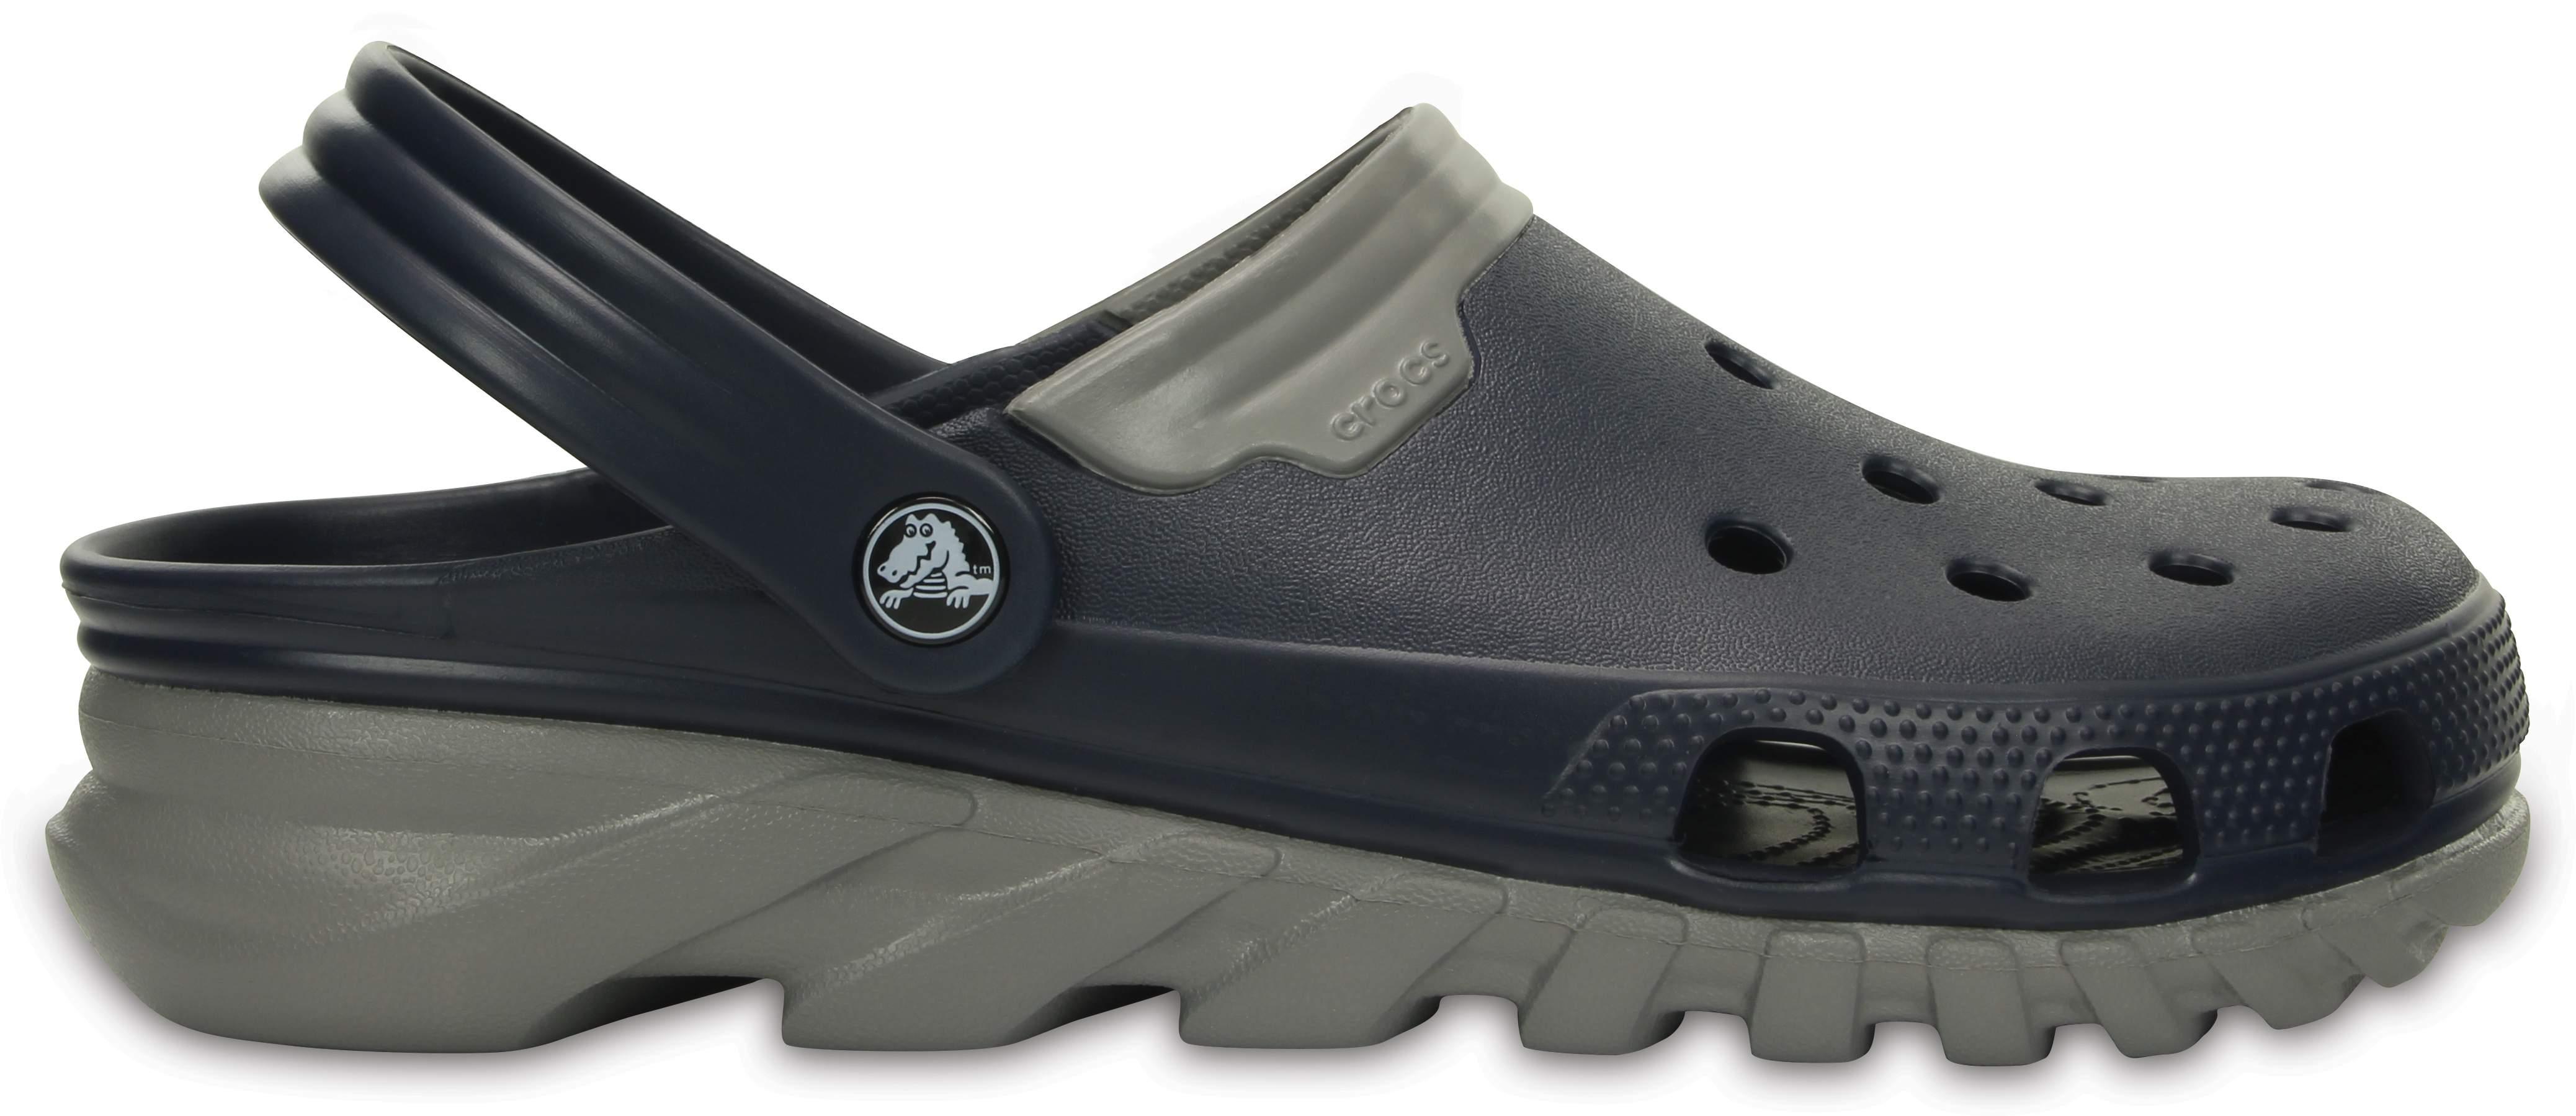 Crocs Duet Sport Clog Navy/Smoke Größe EU 45-46